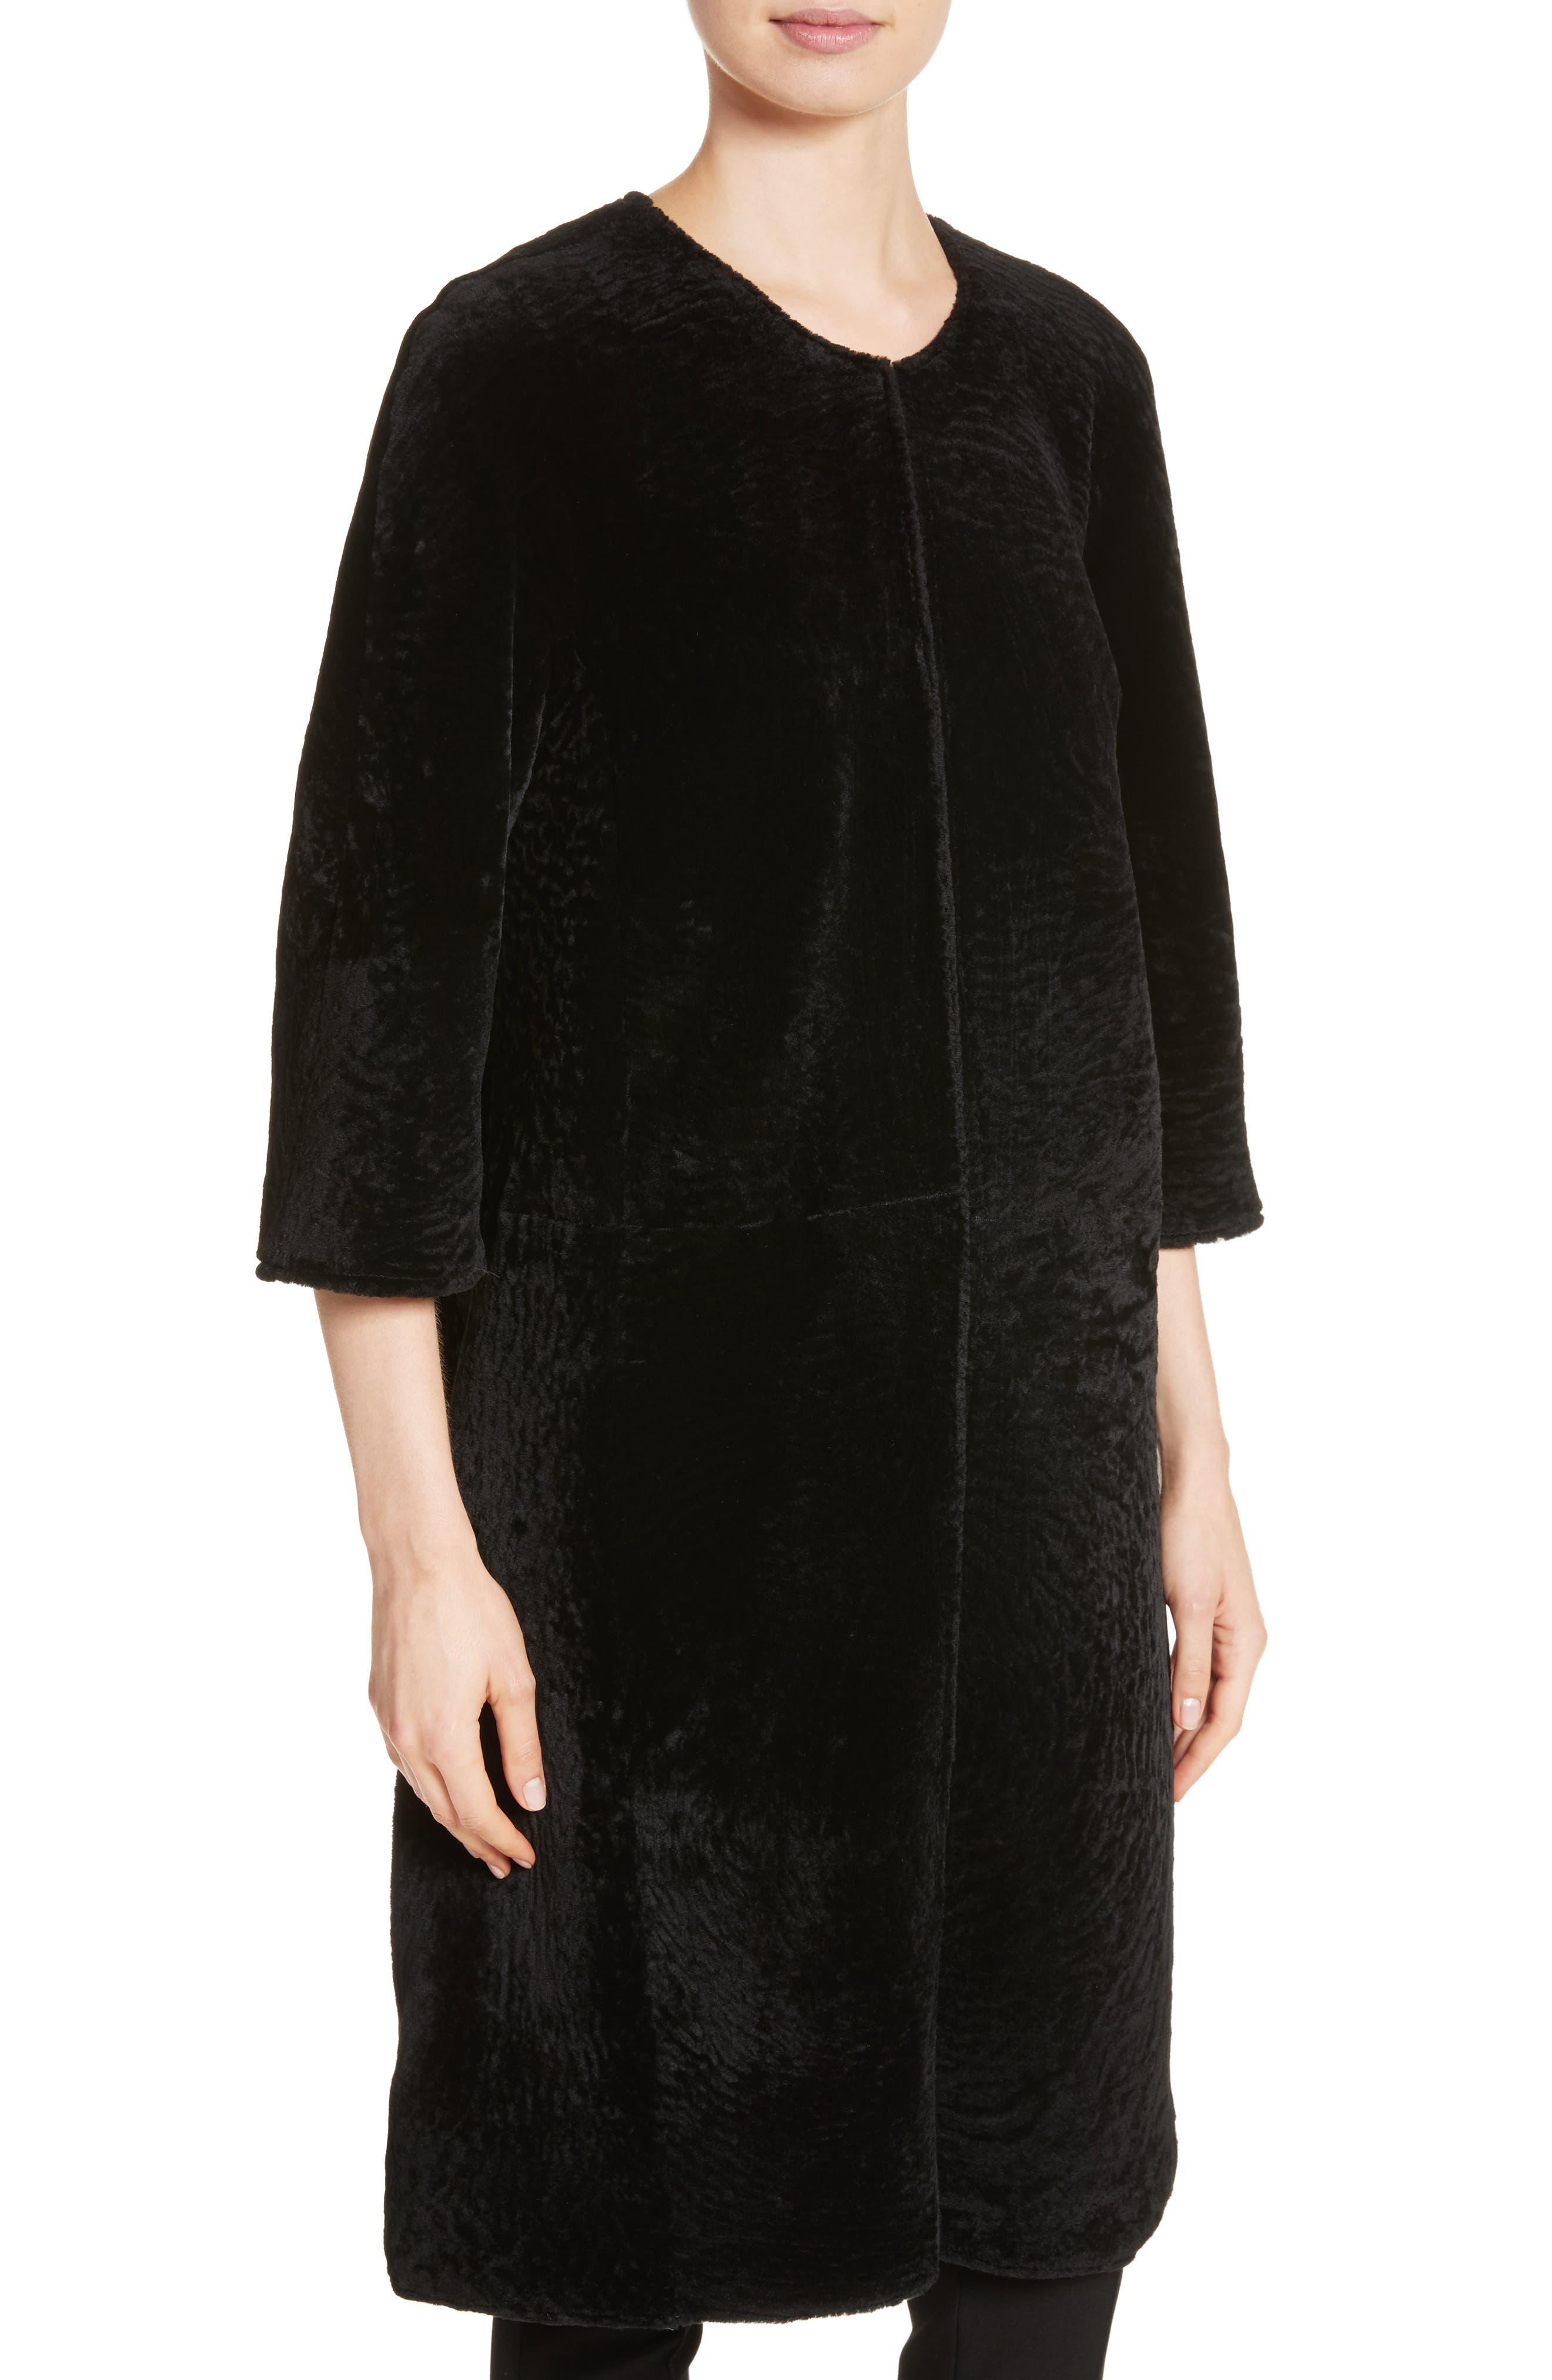 Genuine Textured Lamb Fur Jacket,                             Alternate thumbnail 3, color,                             Caviar